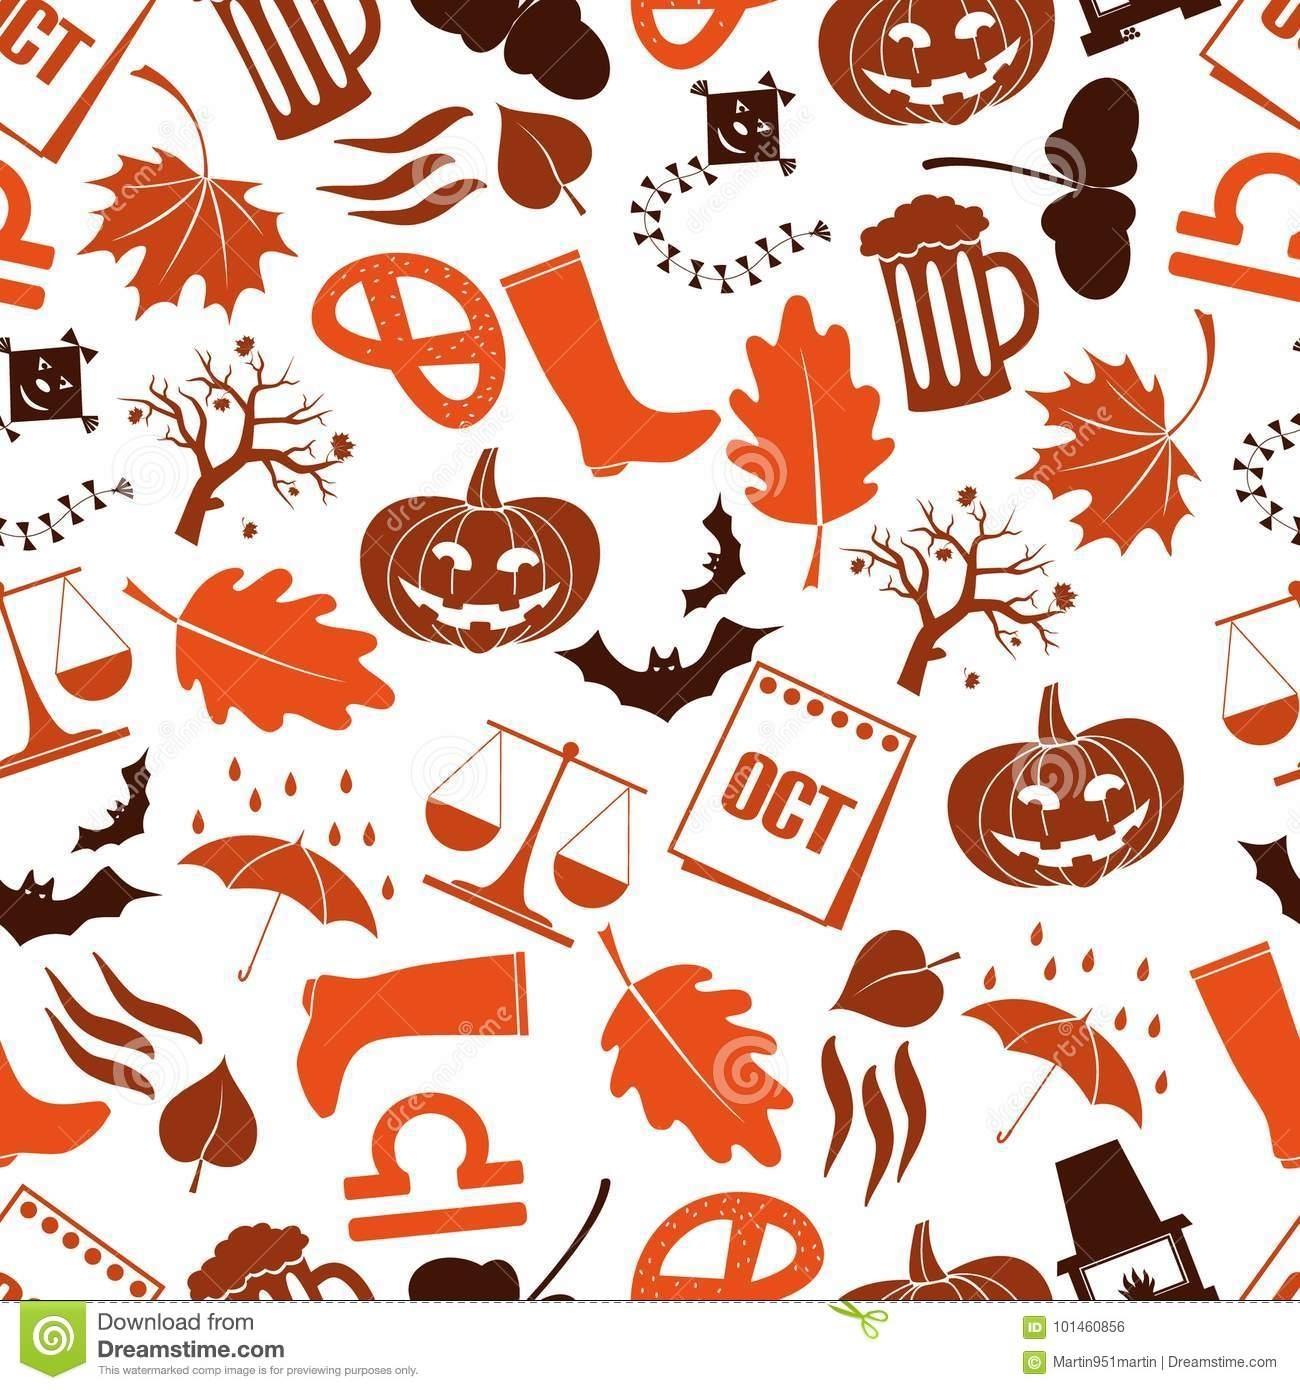 Pick Free September Clip Art Themes